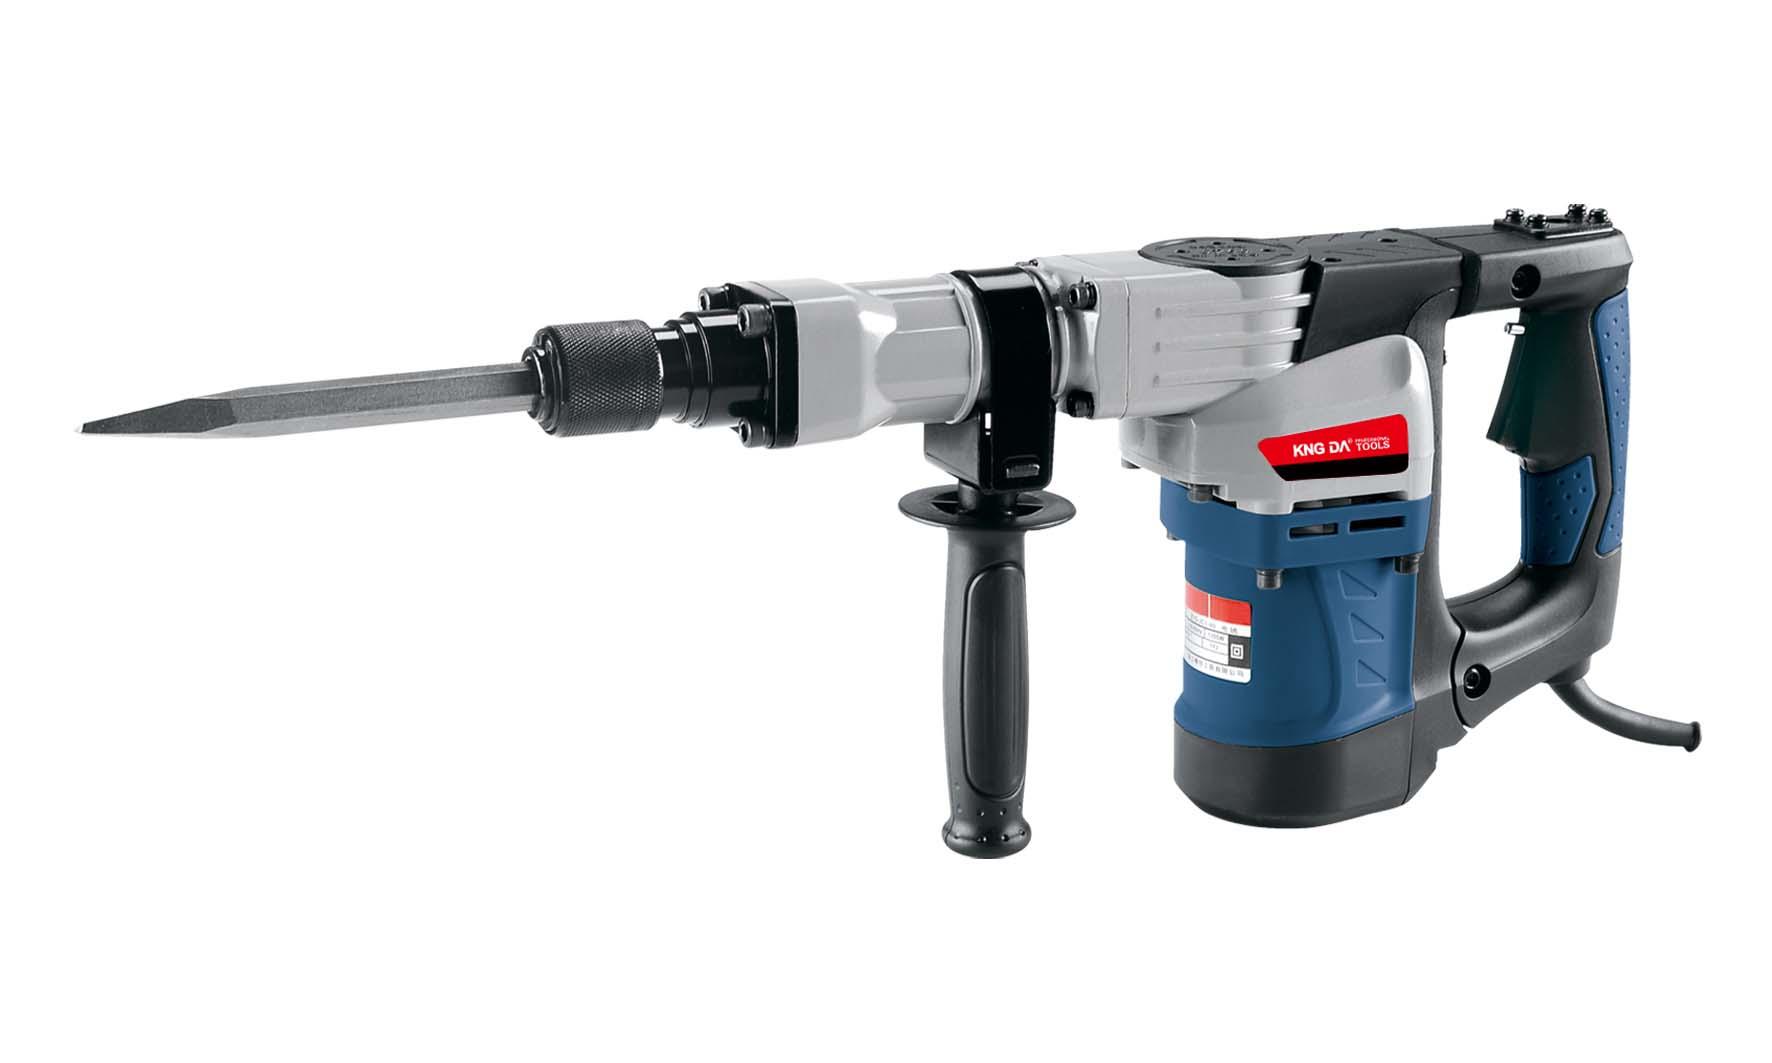 Kd0940x 1300w 40mm Tools Demolition Hammer Breaker